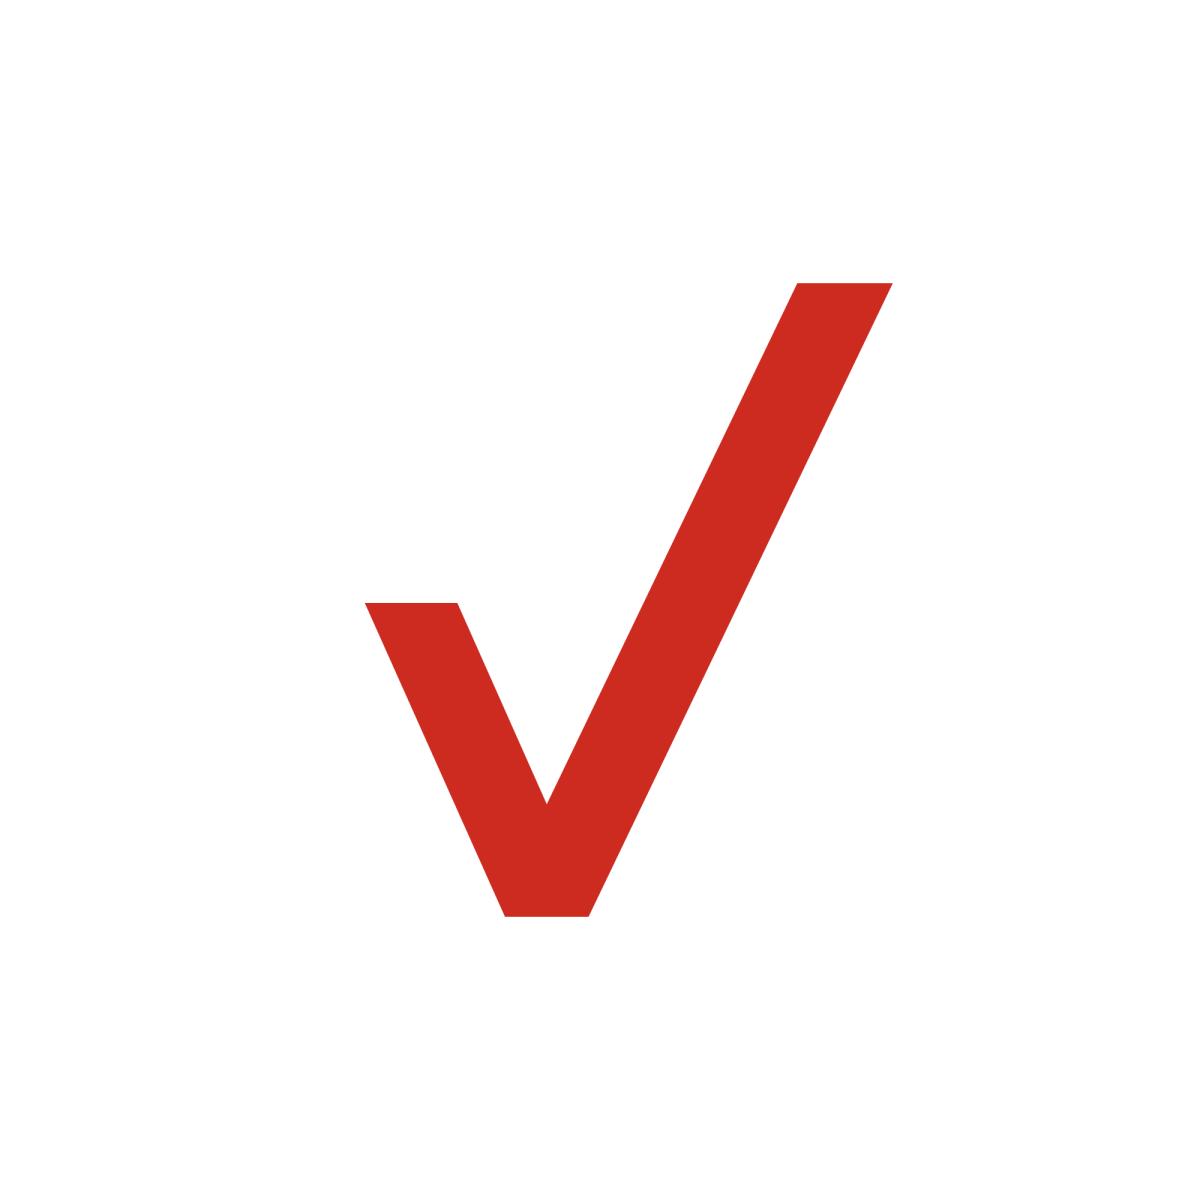 Verizon Logo United States Letter V Lettering Single Letter Logo